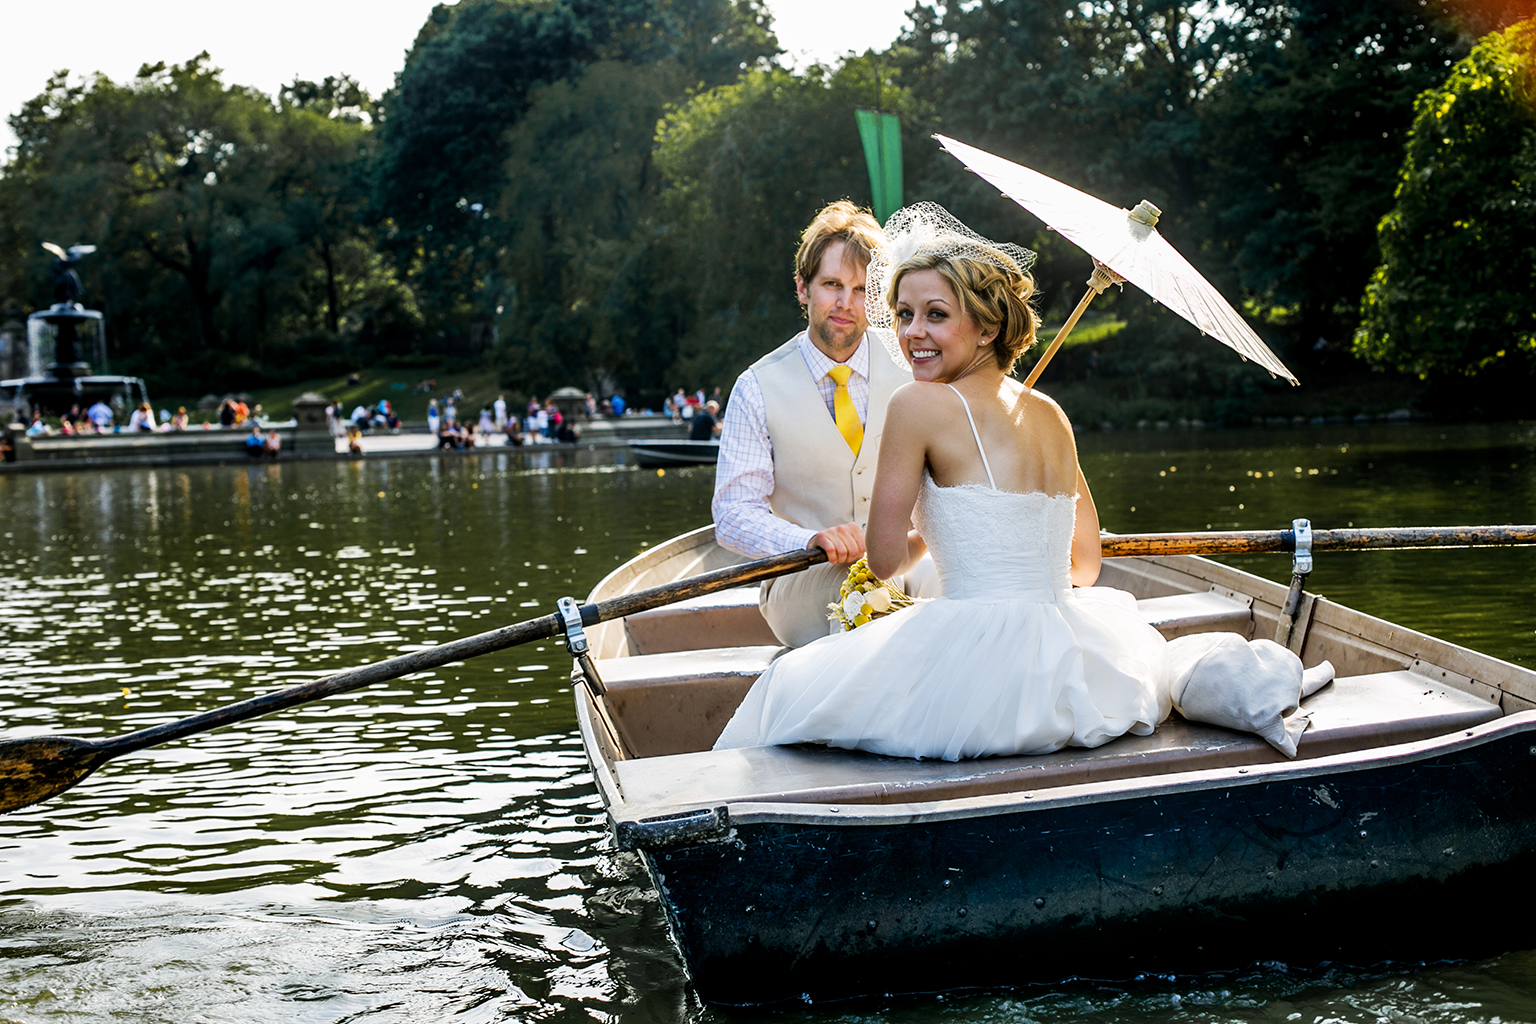 Photo 3 Central Park Wedding 2 | VladLeto